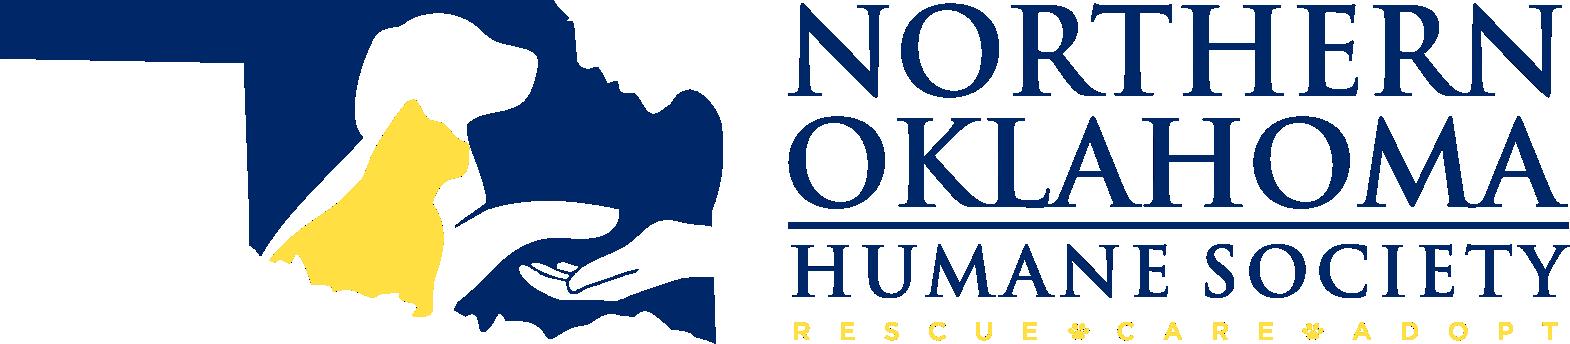 Northern Oklahoma Humane Society